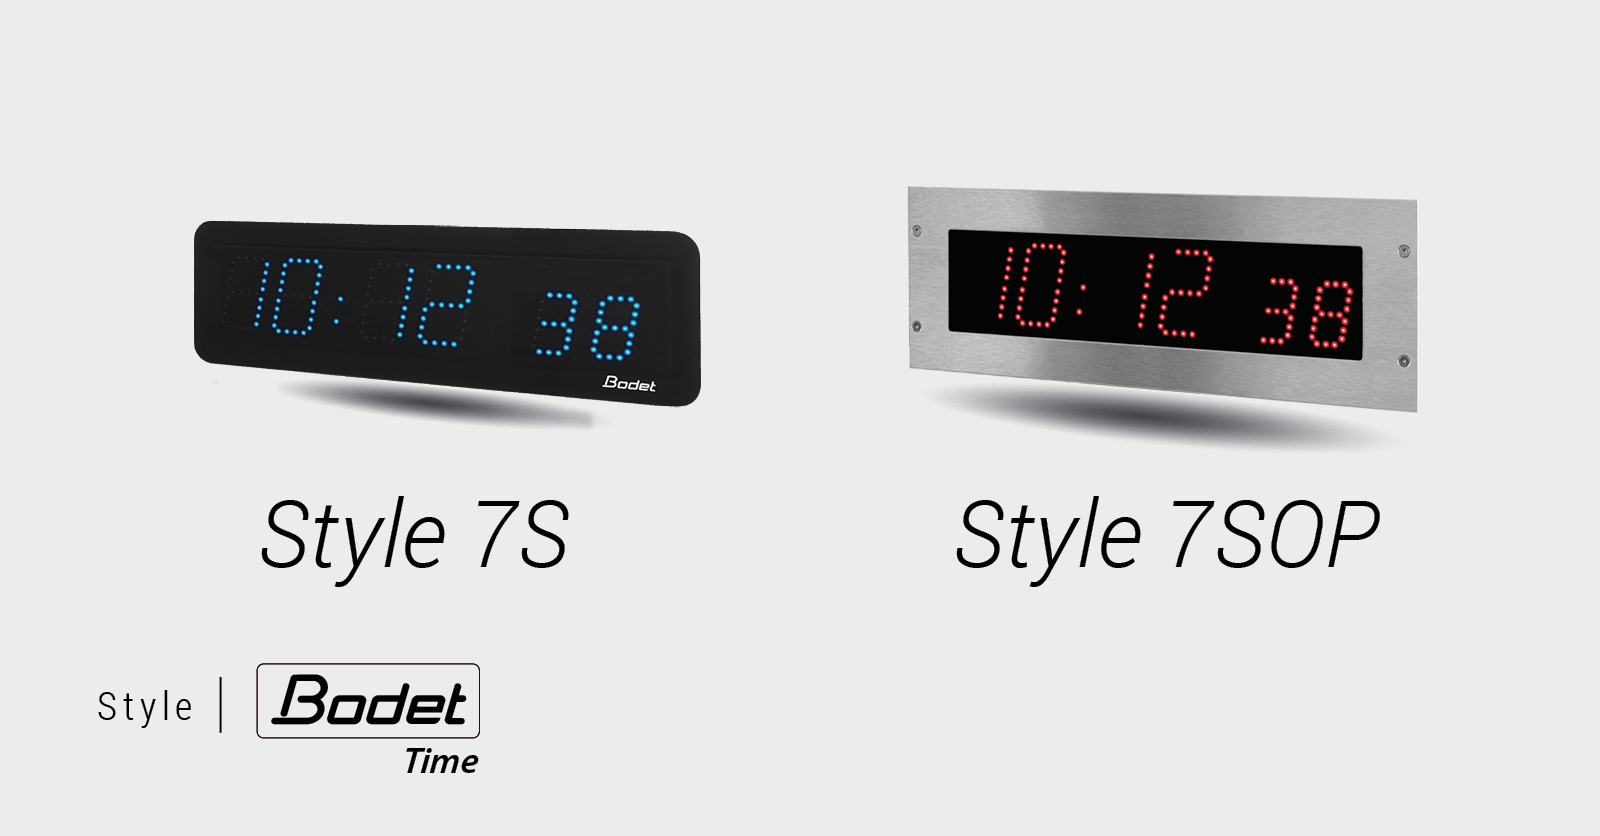 Horloges digitales Style 7S et Style 7SOP